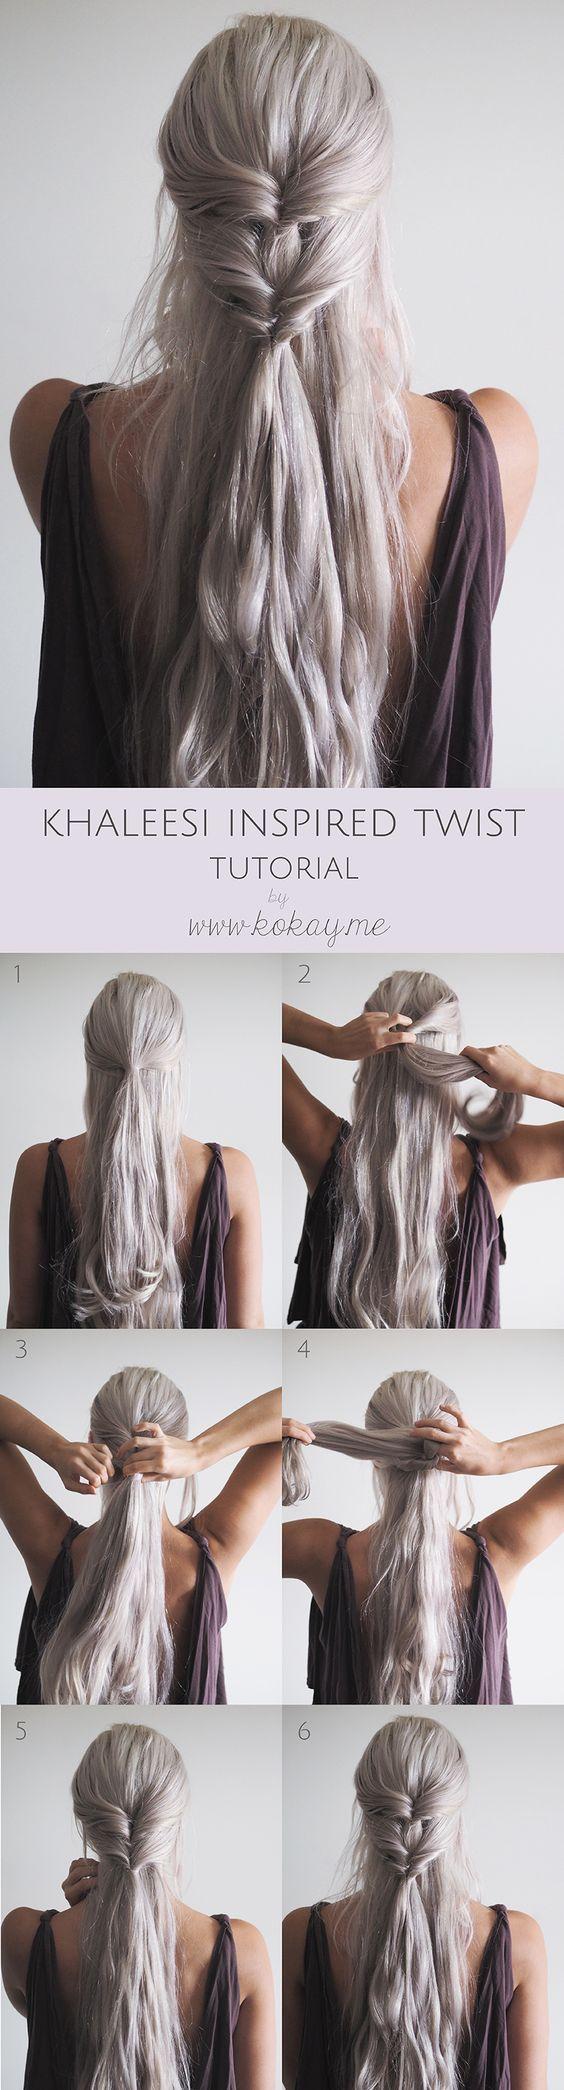 best frisuren images on pinterest hairstyle ideas coiffure